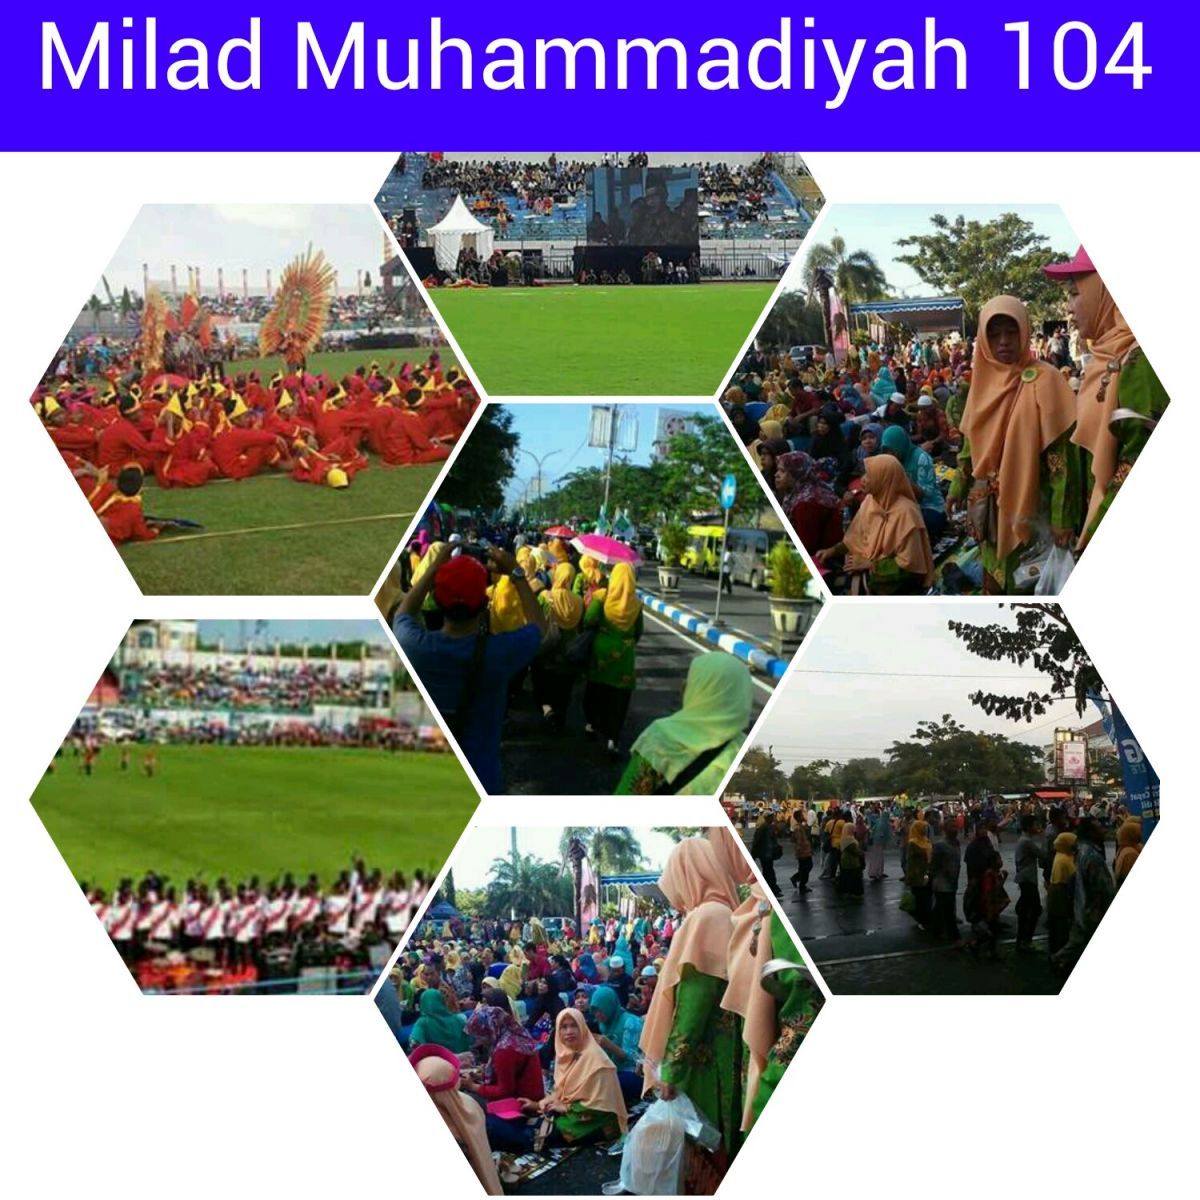 Semarak Milad Muhammadiyah 104 Bangkalan